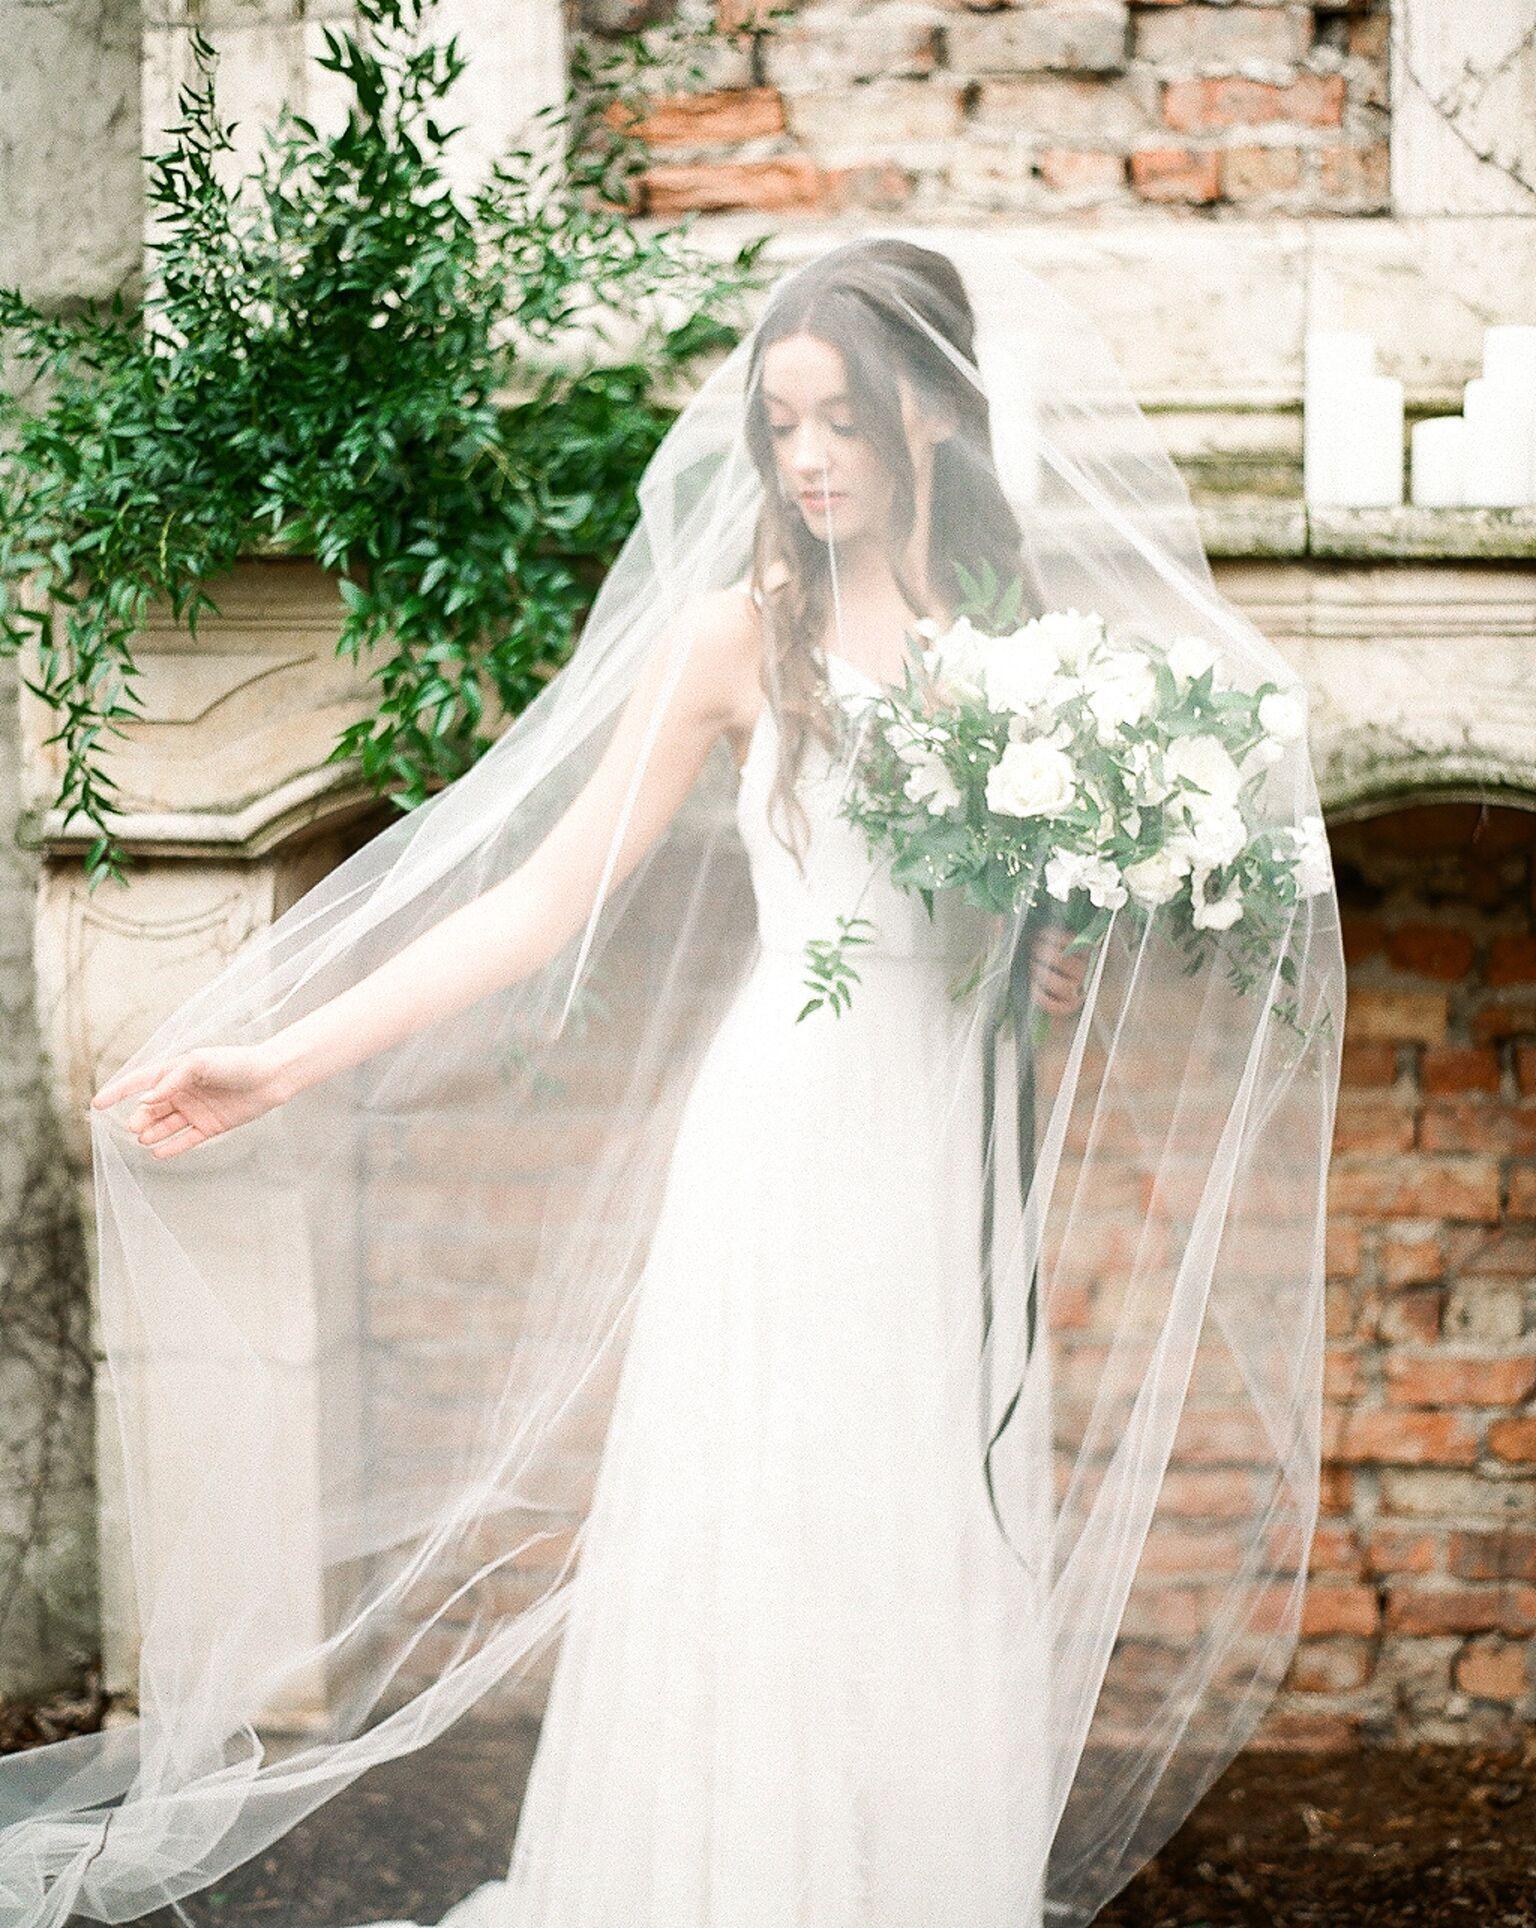 Chicago wedding dresses  Alyssa Kristin Bridal  Chicago Wedding Dress Designer  Bonphotage